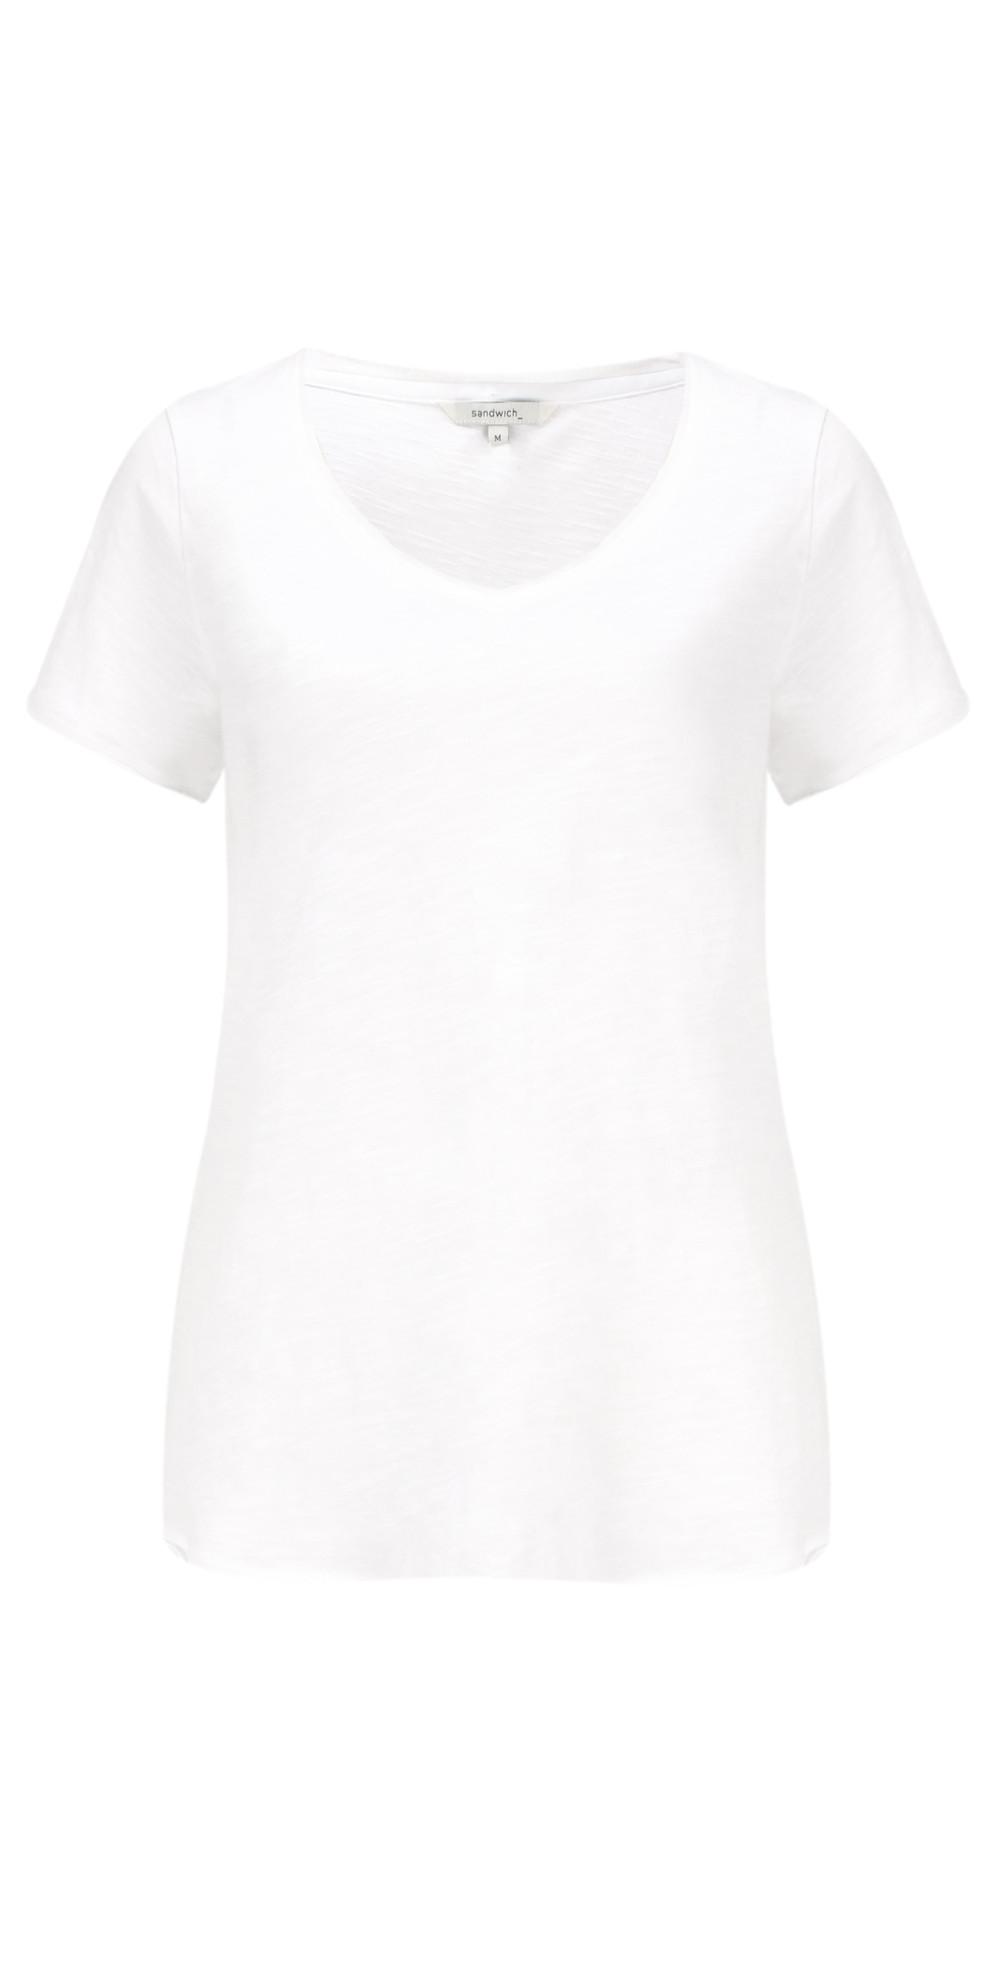 Essential Slub Jersey V Neck T-shirt main image